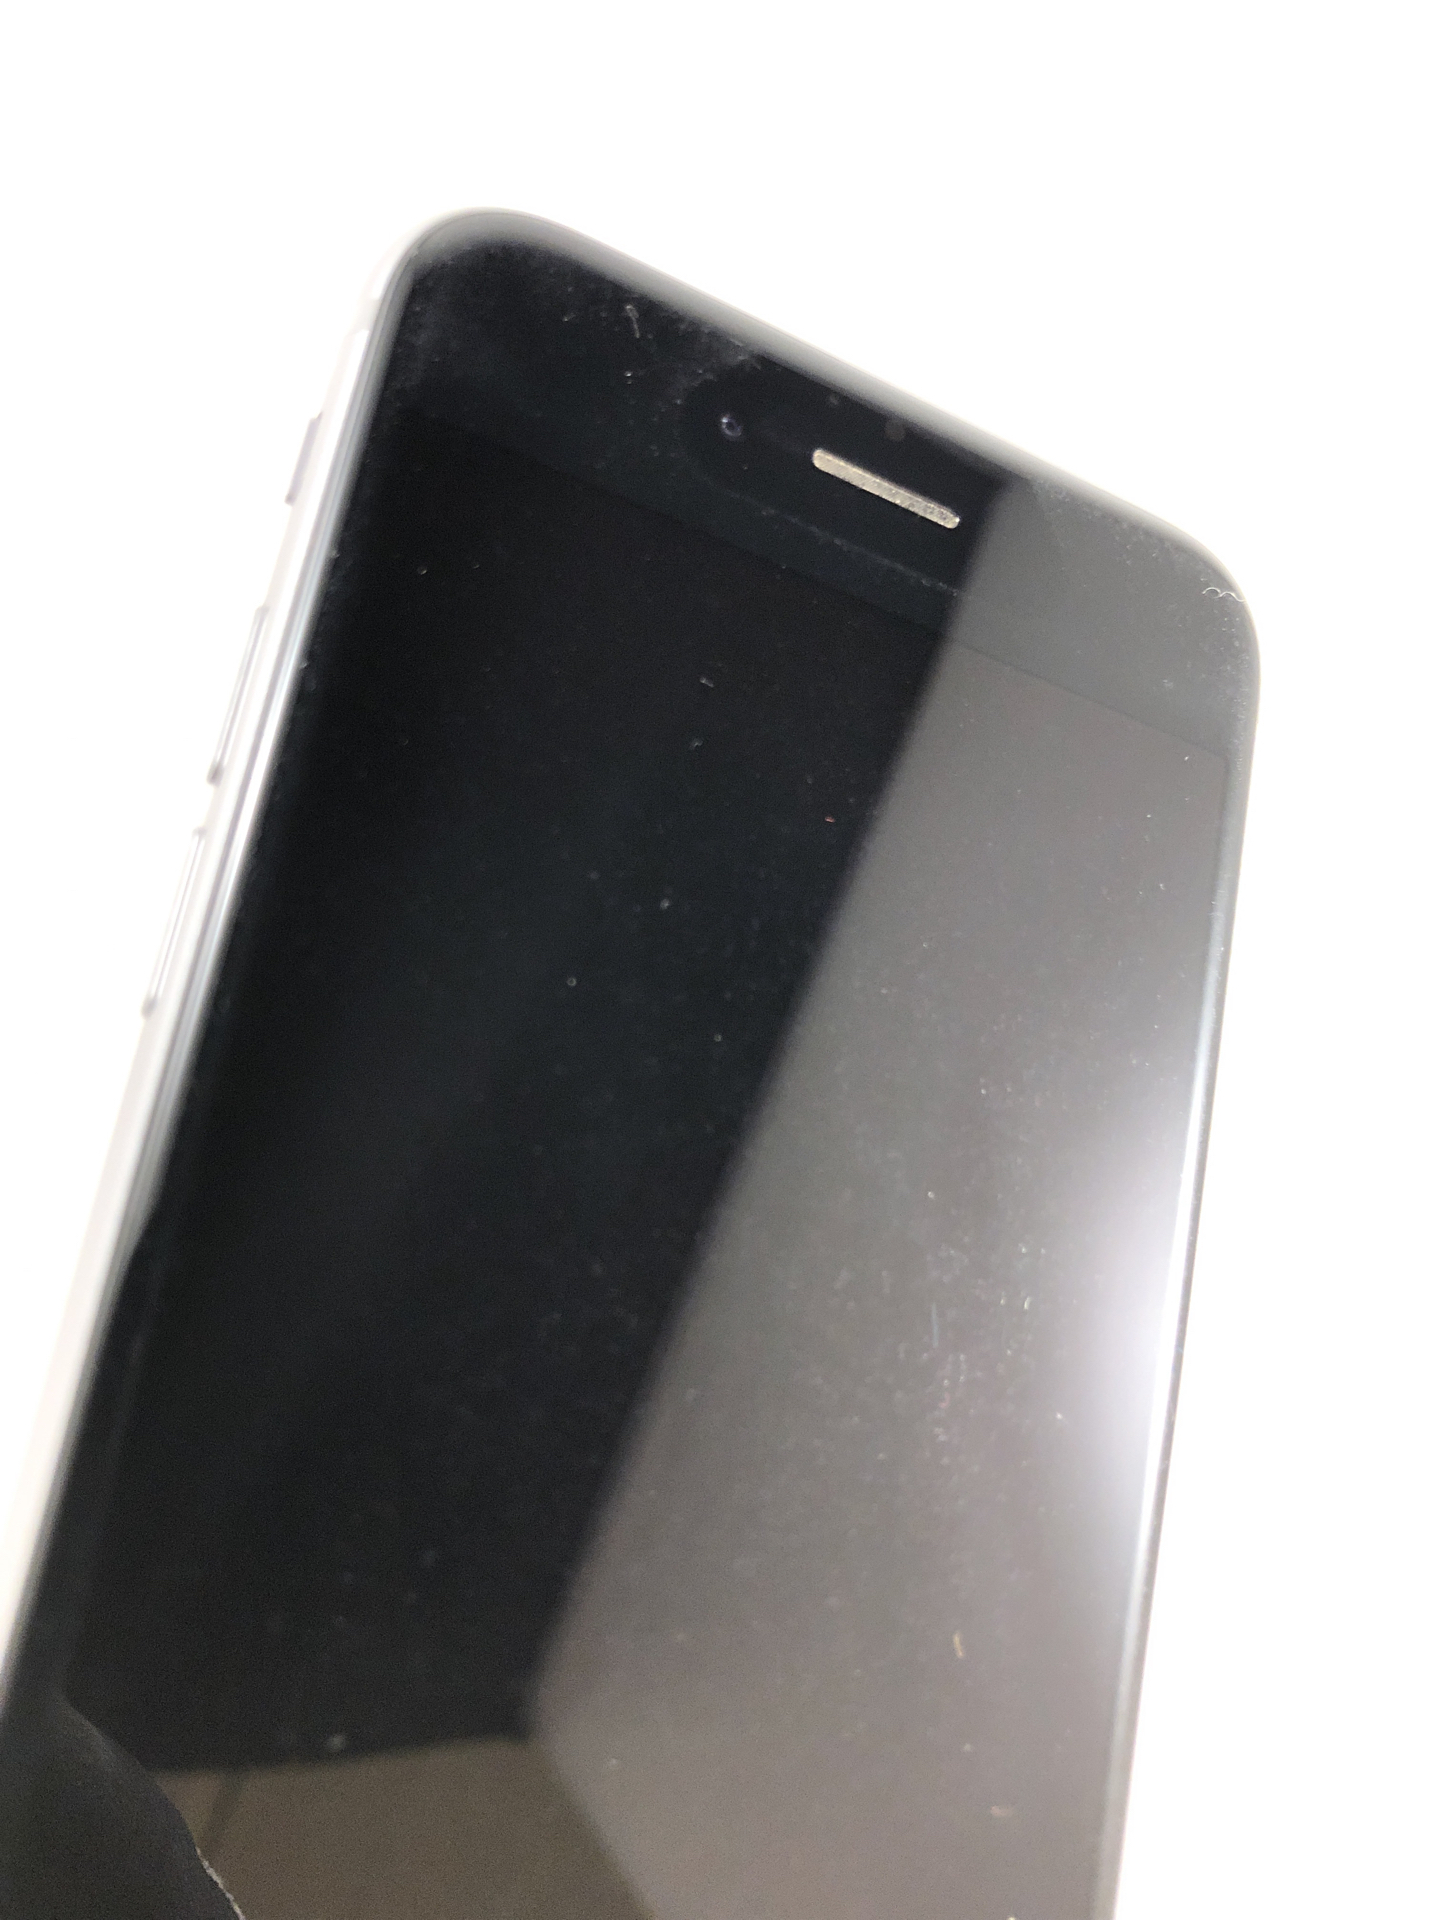 iPhone 6S 64GB, 64GB, Space Gray, bild 3